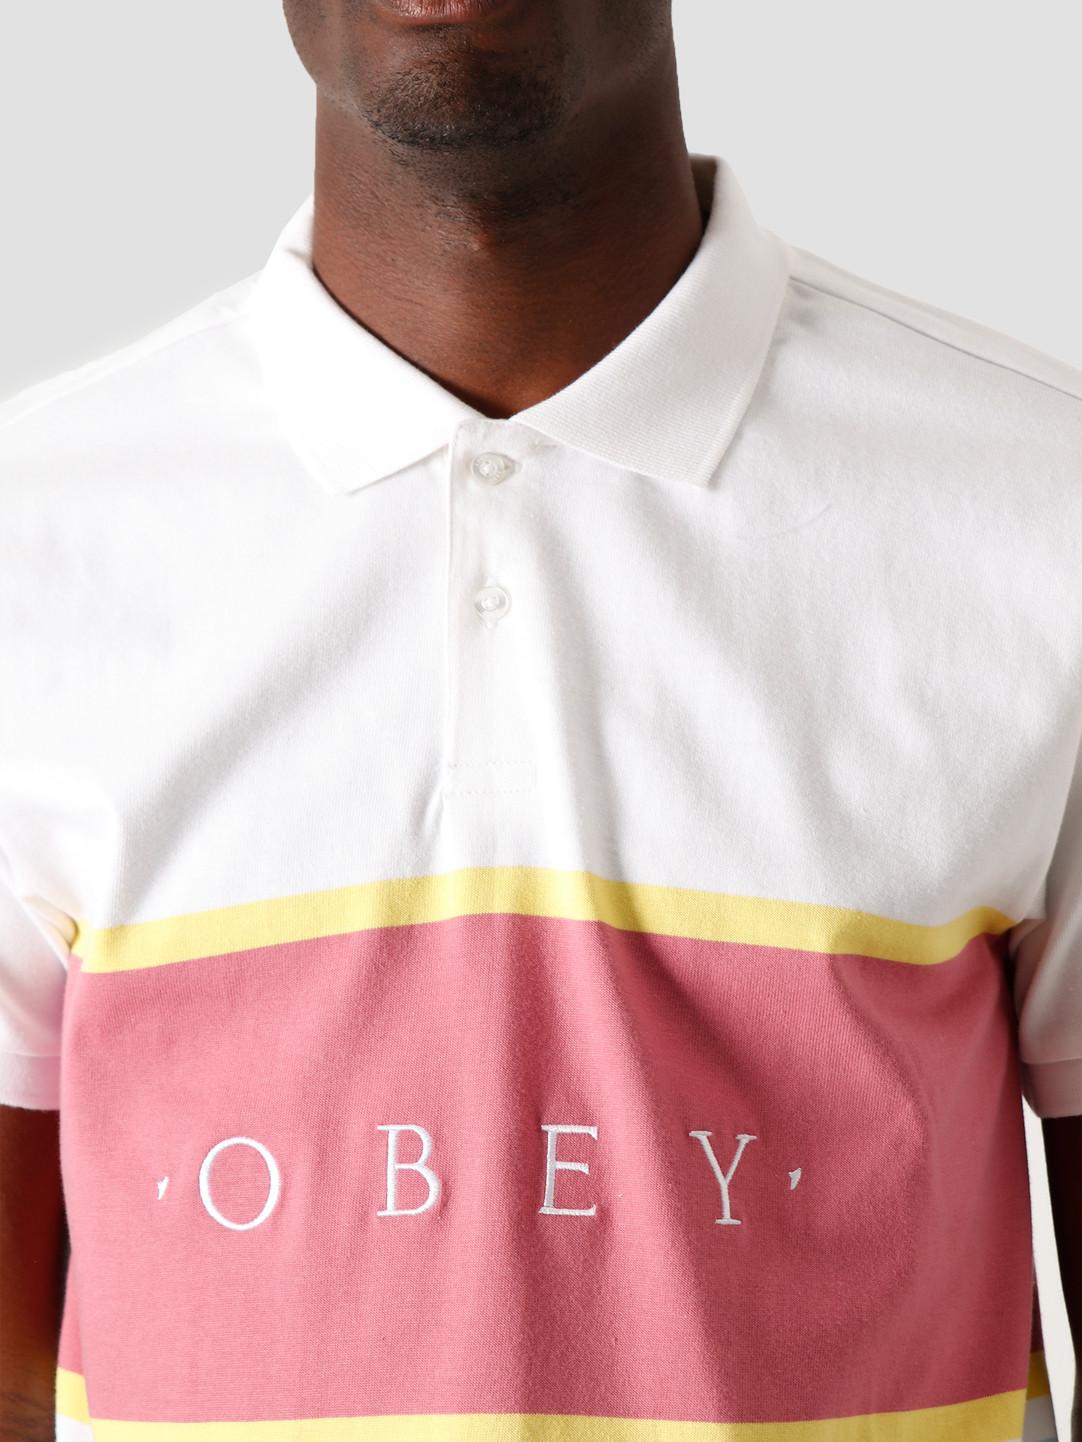 Obey Obey Pledge Polo SS White Multi 131090057 WTM